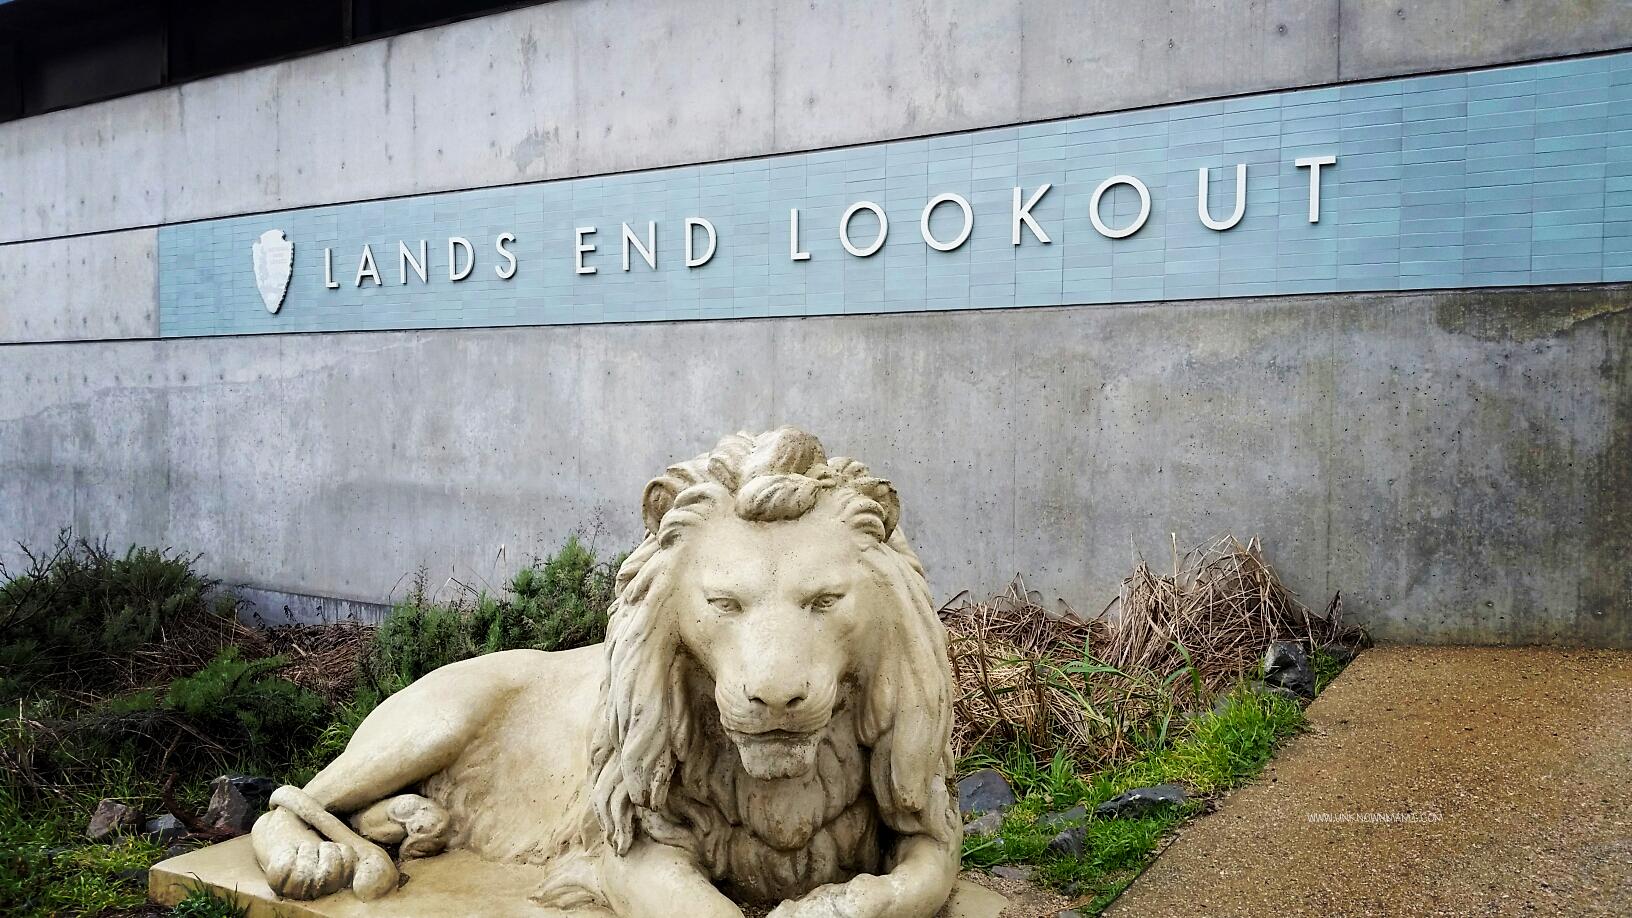 Lands End Lookout Sign